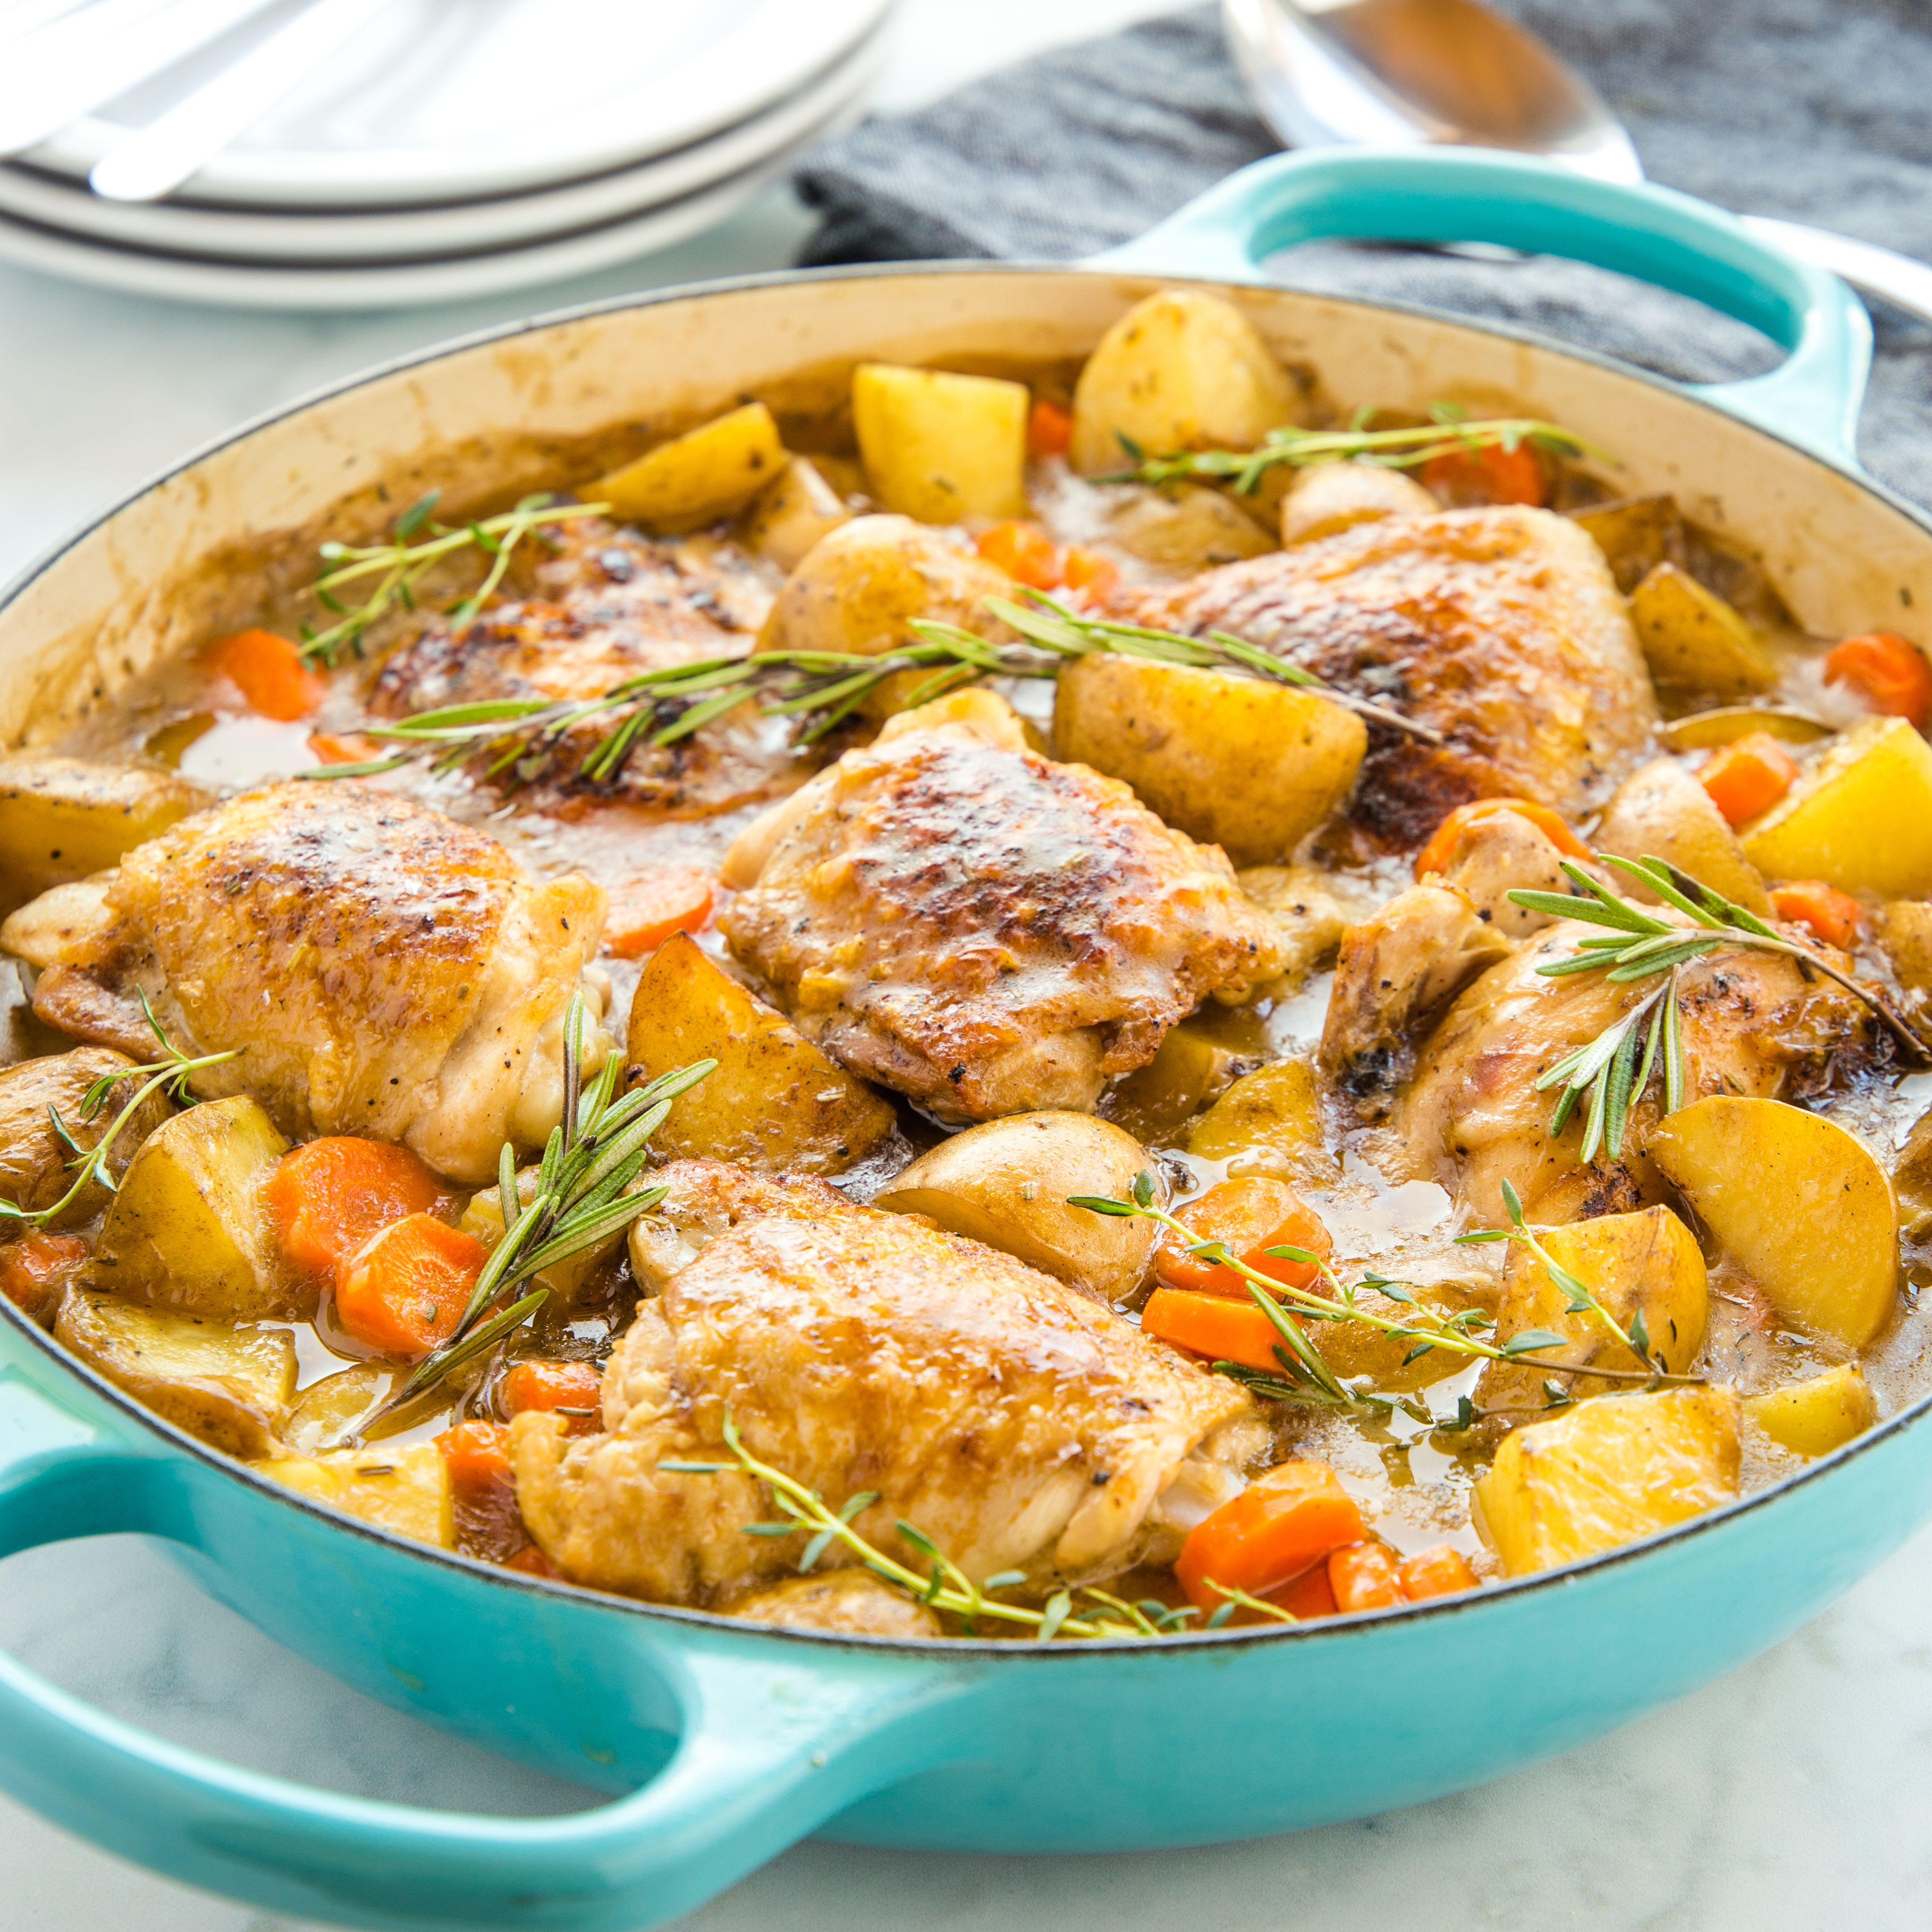 Easy One Pot Roasted Chicken Dinner Recipe Chicken Dinner Recipes Chicken Dinner Cooking Classy Recipes